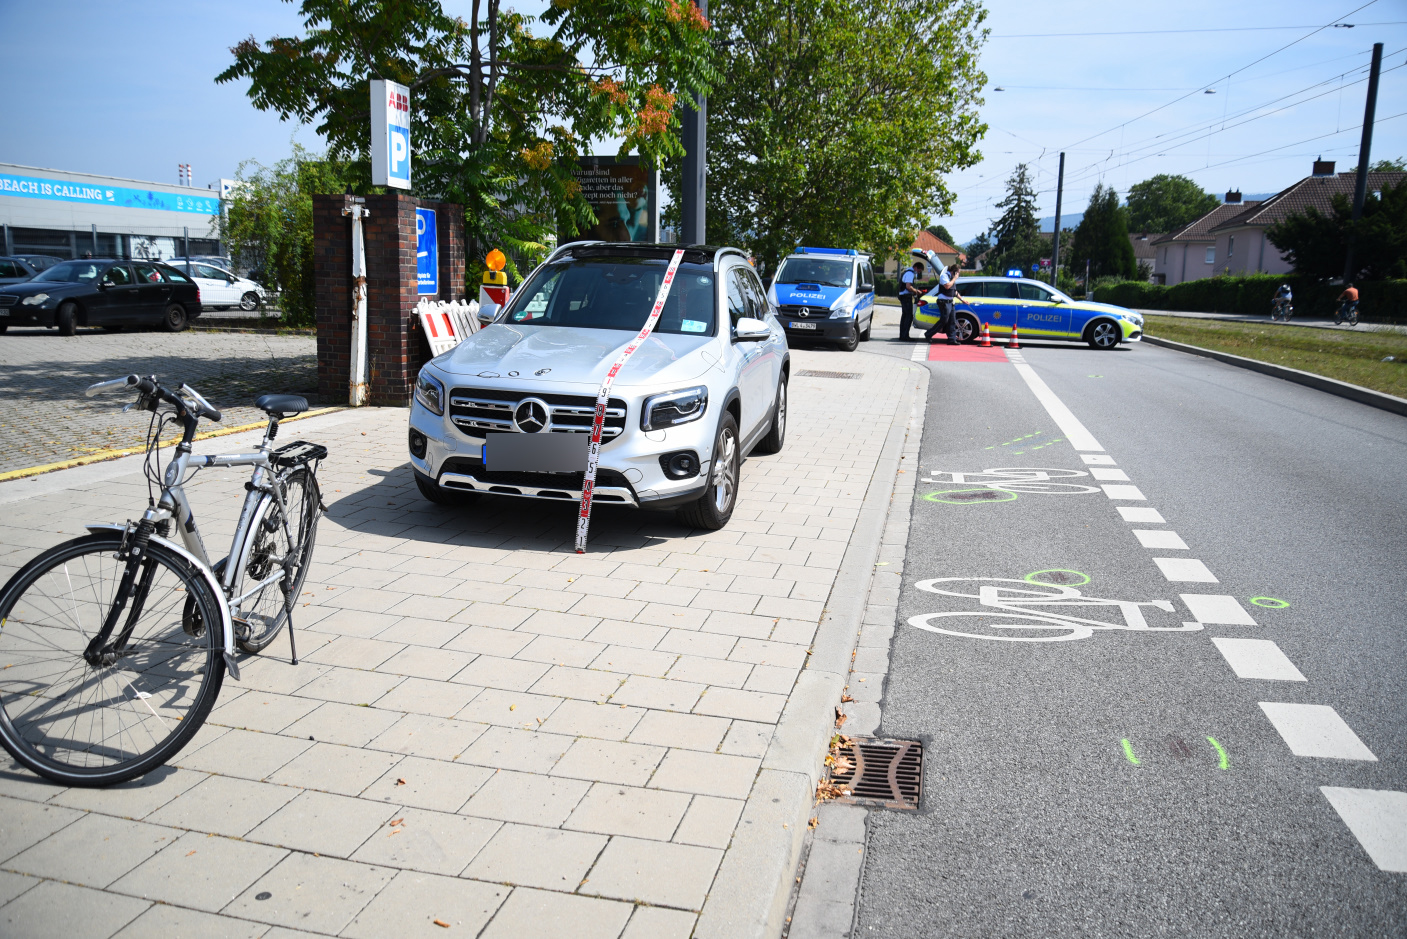 Fahrradfahrer bei Verkehrsunfall lebensgefährlich verletzt - Zeugen gesucht